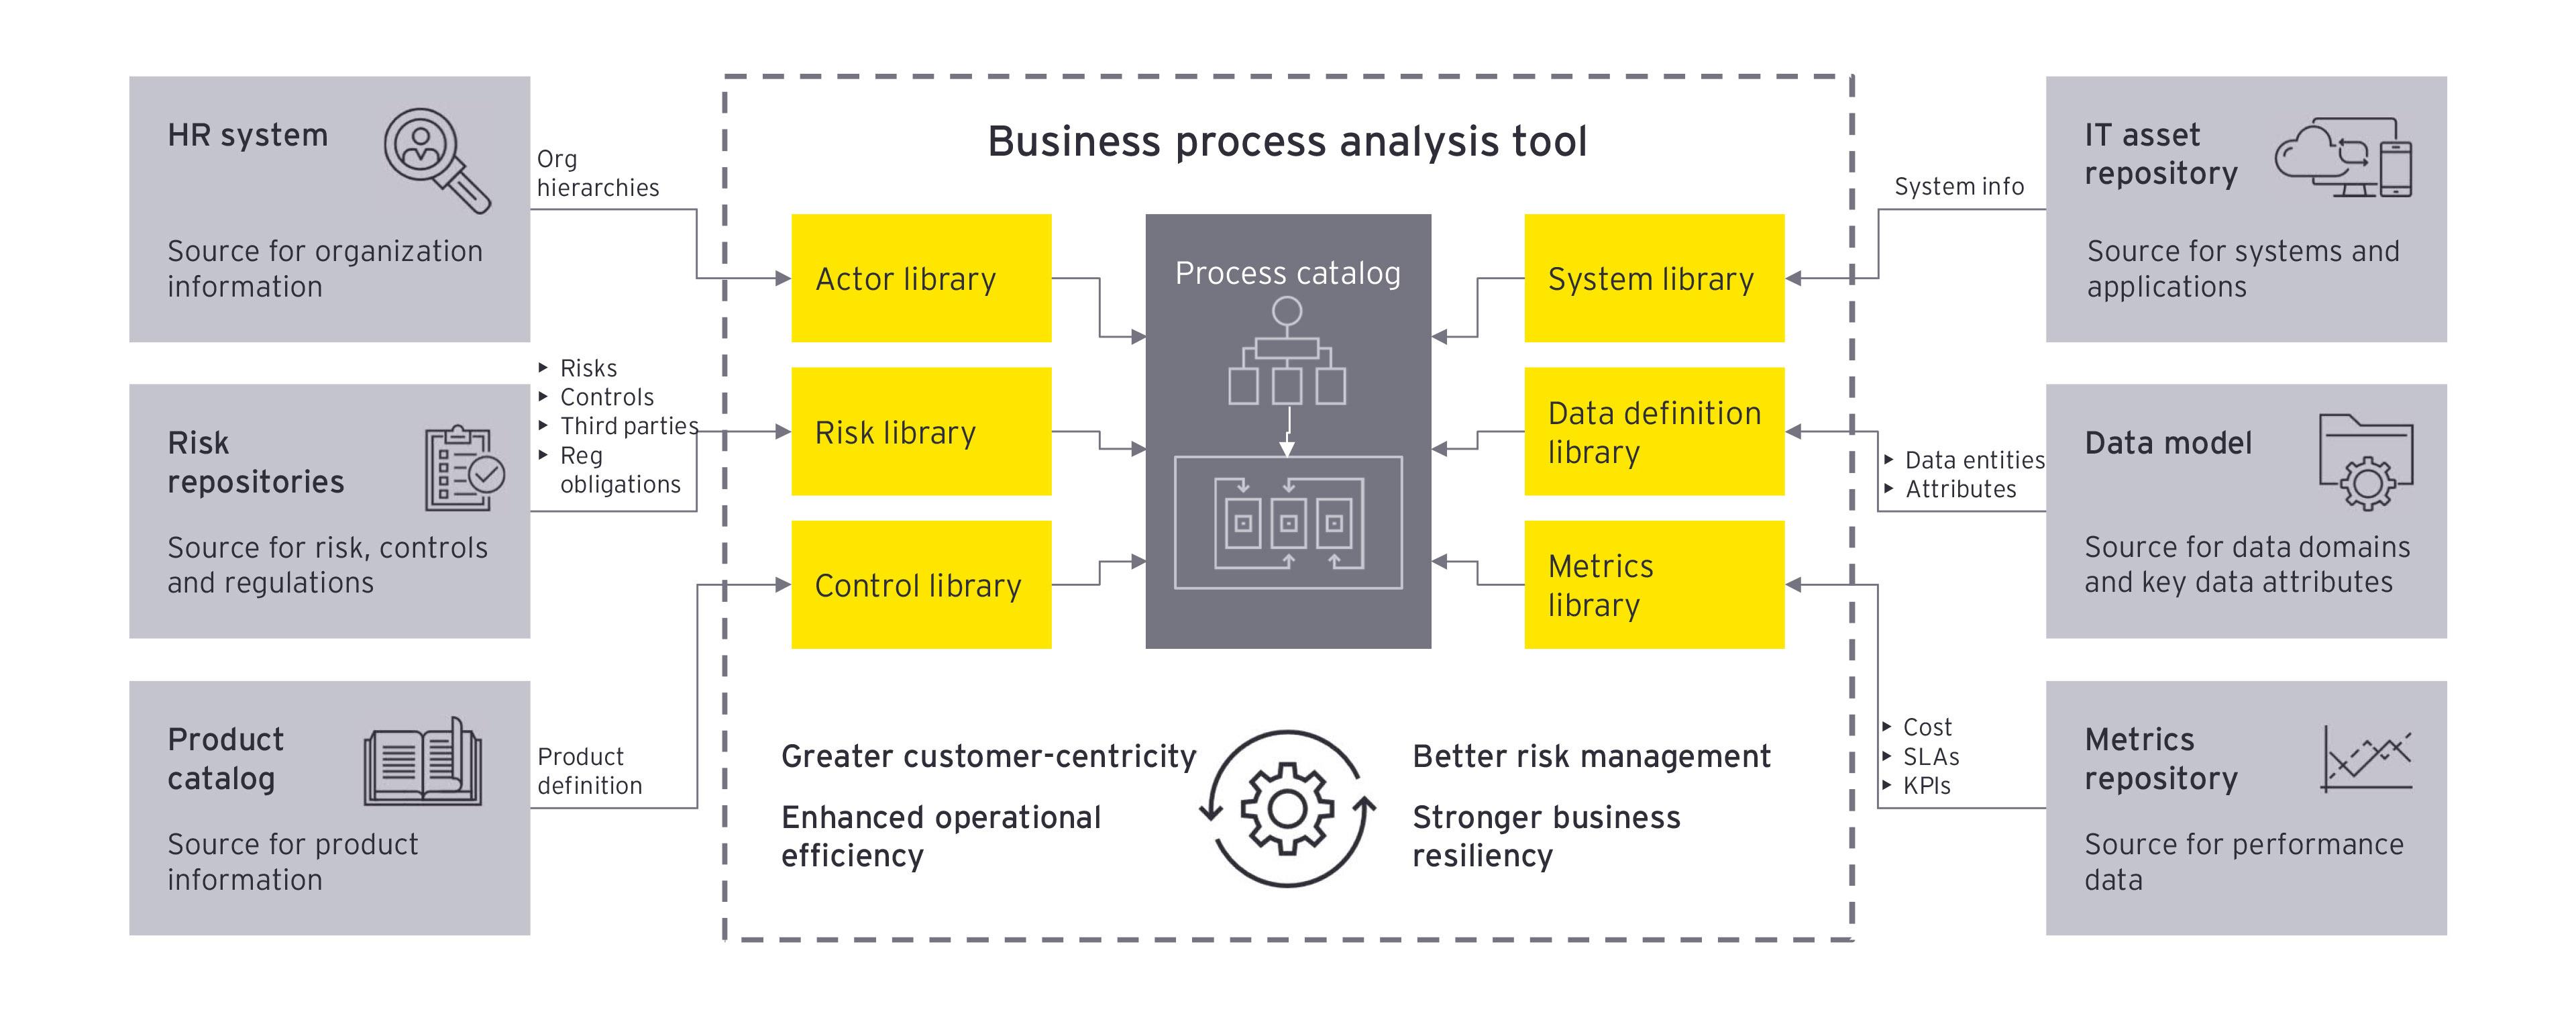 Business process analysis tool graphic image